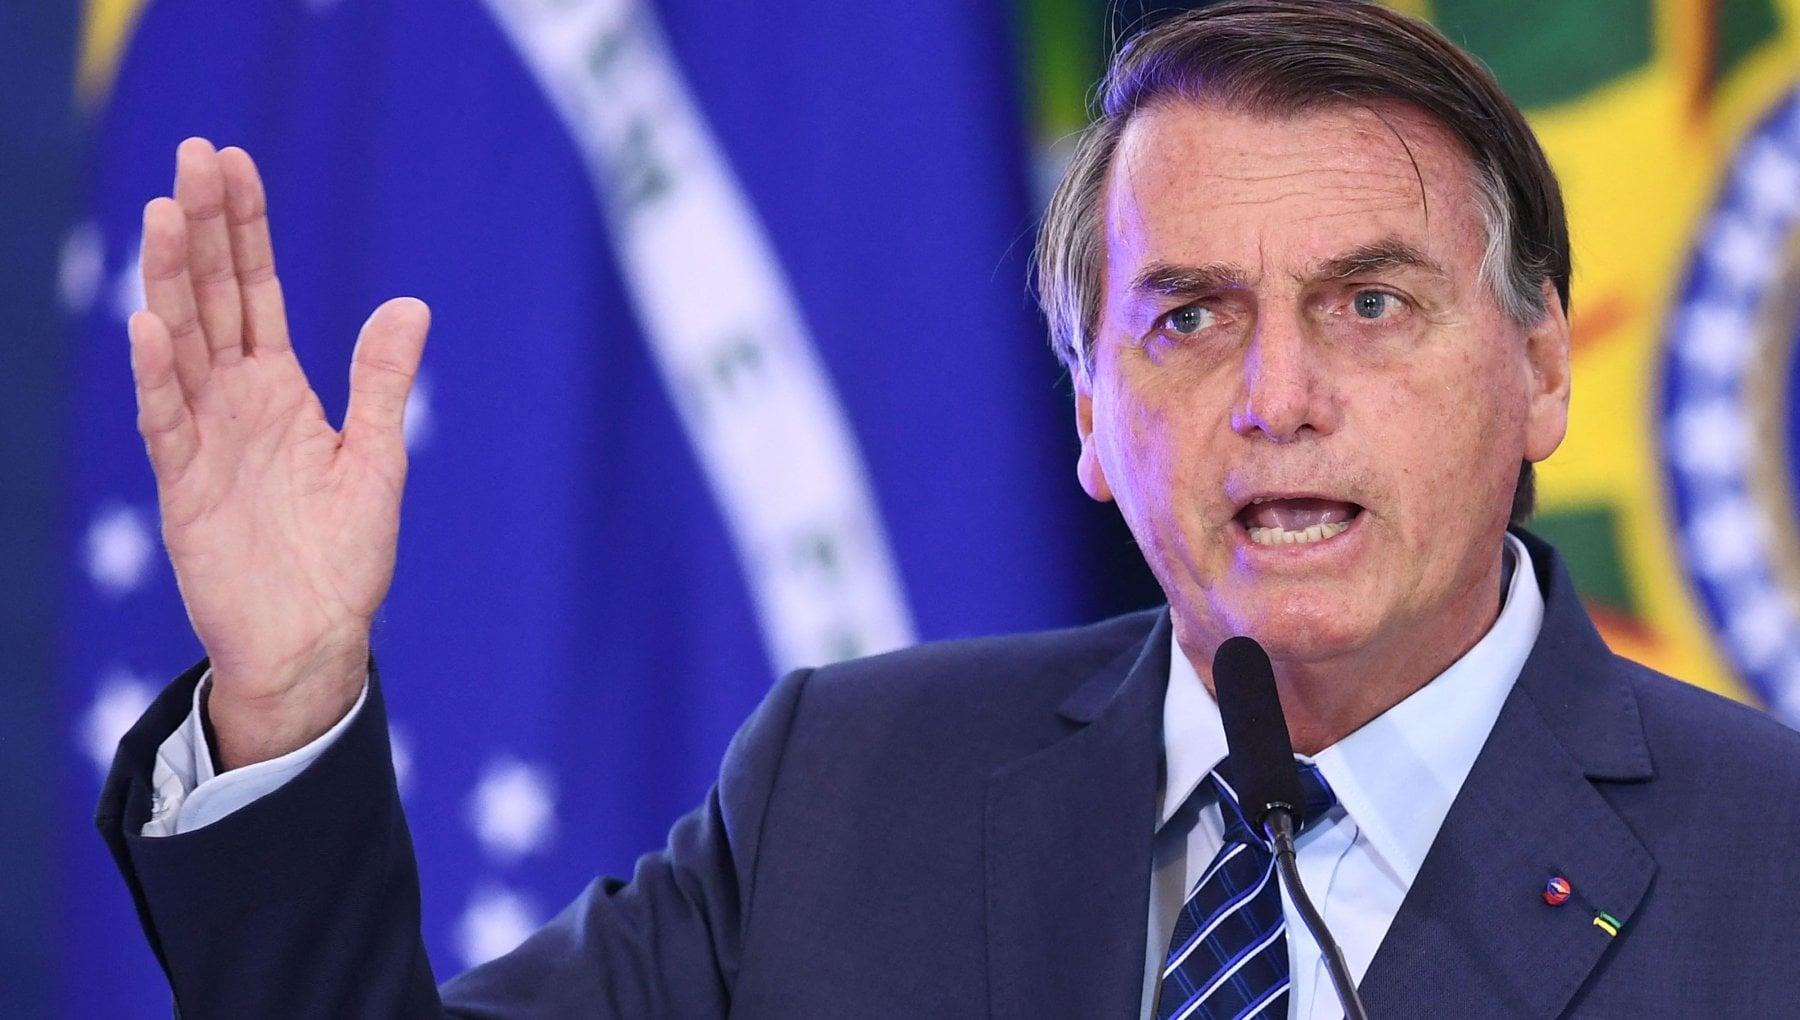 024251132 0c247278 aaa1 4e60 a016 abd872f9c646 - Brasile: multa a Bolsonaro per assembramento senza mascherina